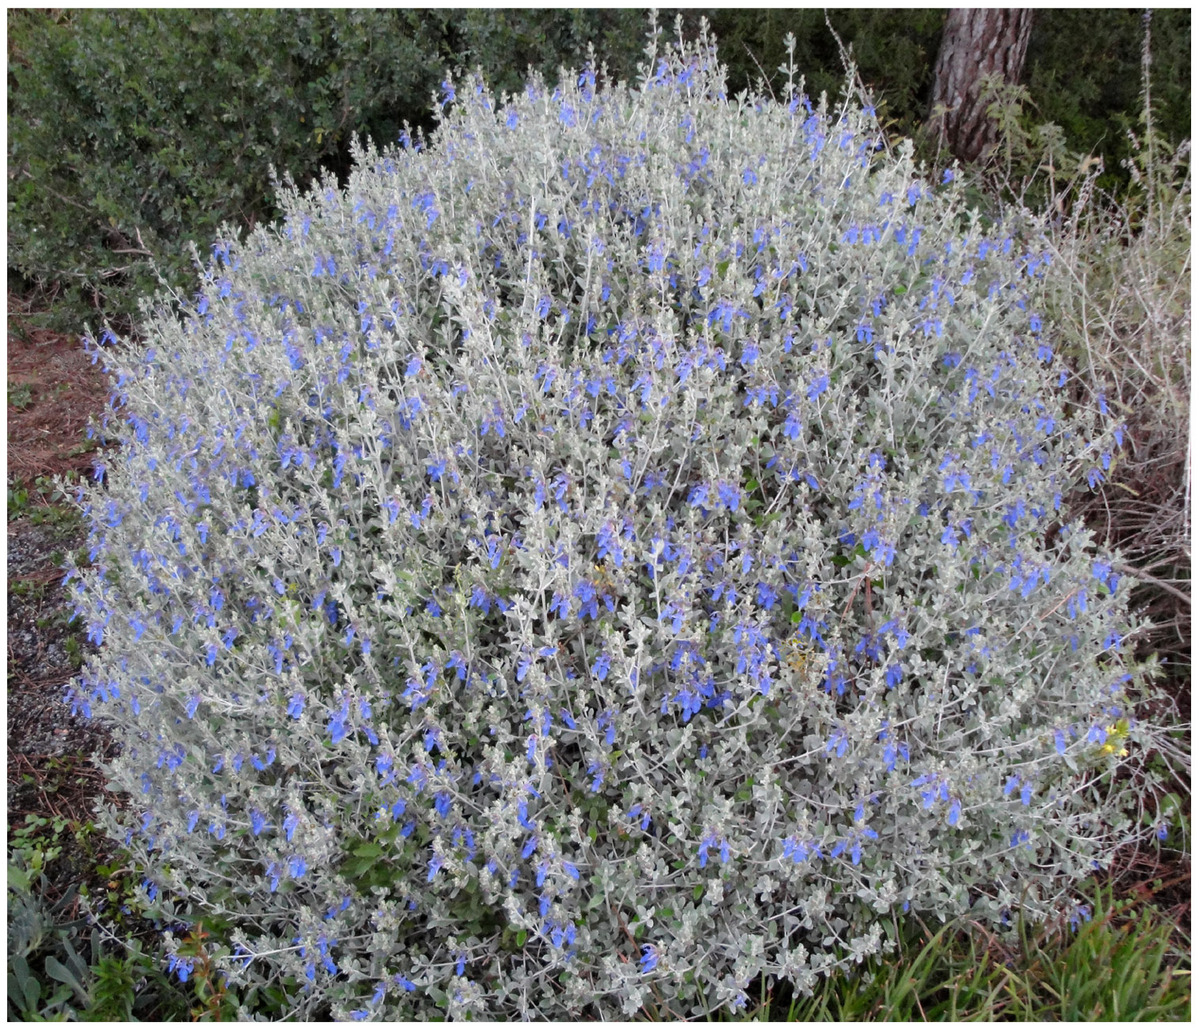 um jardim para cuidar  arbustos floridos para a primavera